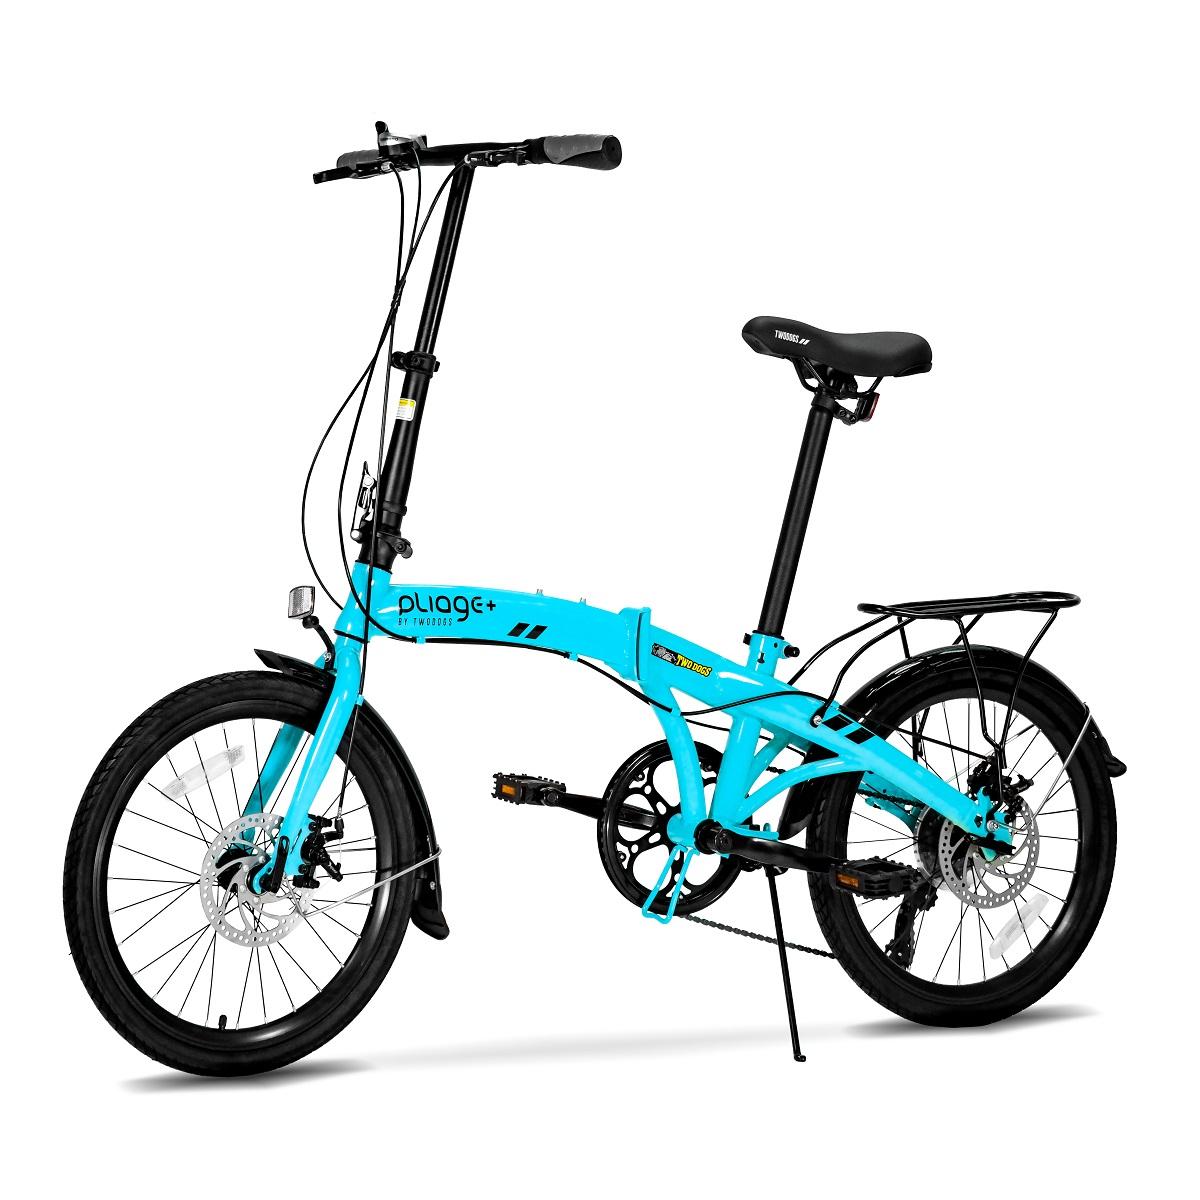 Bicicleta Dobrável Pliage Plus Two Dogs Aro 20 Shimano 7v